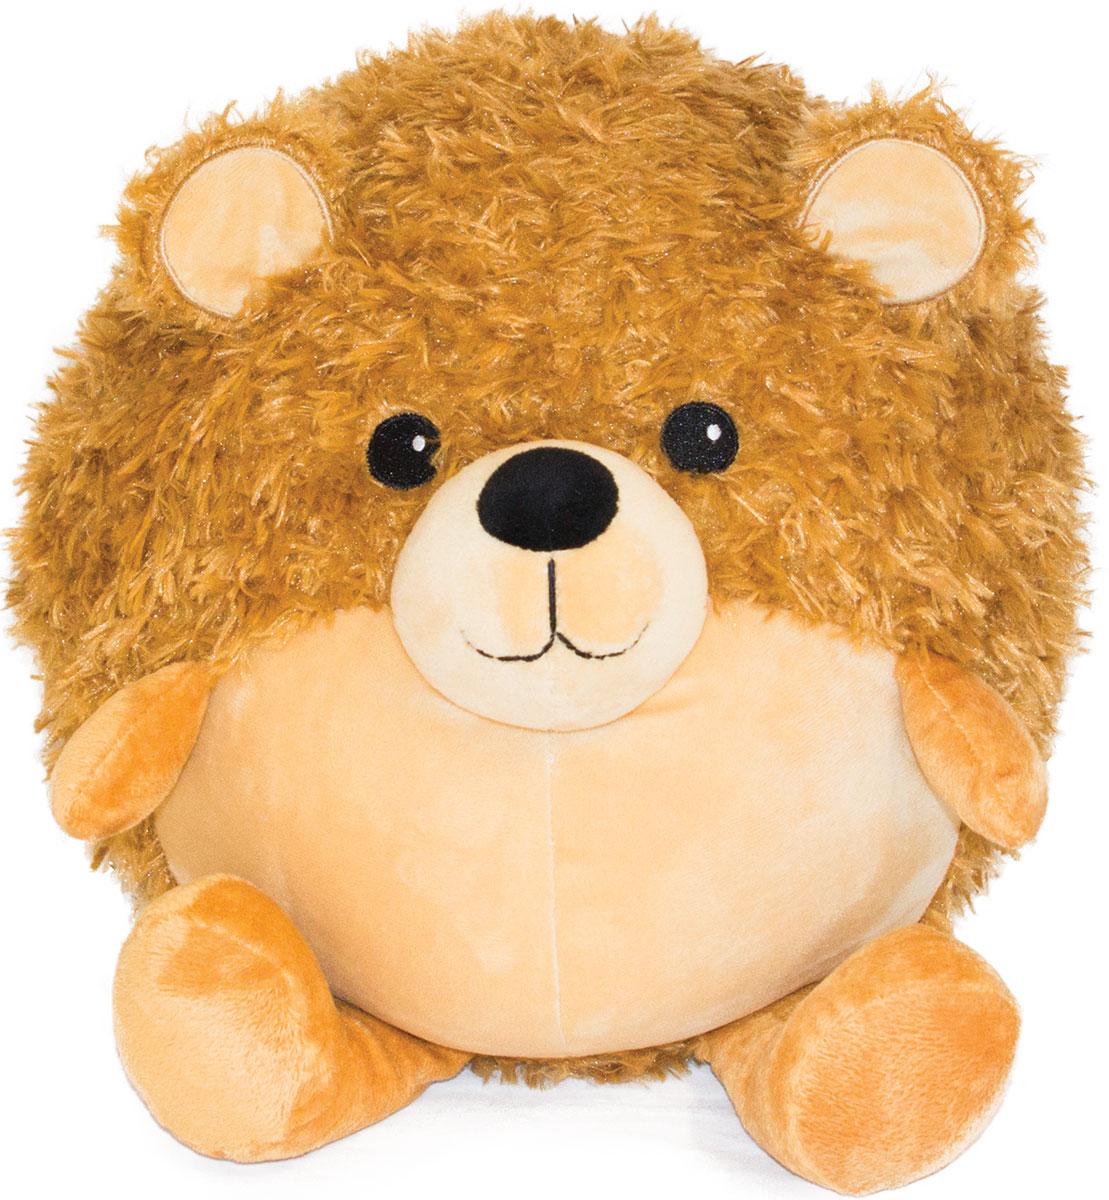 Gulliver Мягкая игрушка Мишутка Пуффи 30 см gulliver мягкая игрушка мишутка хал 20 см